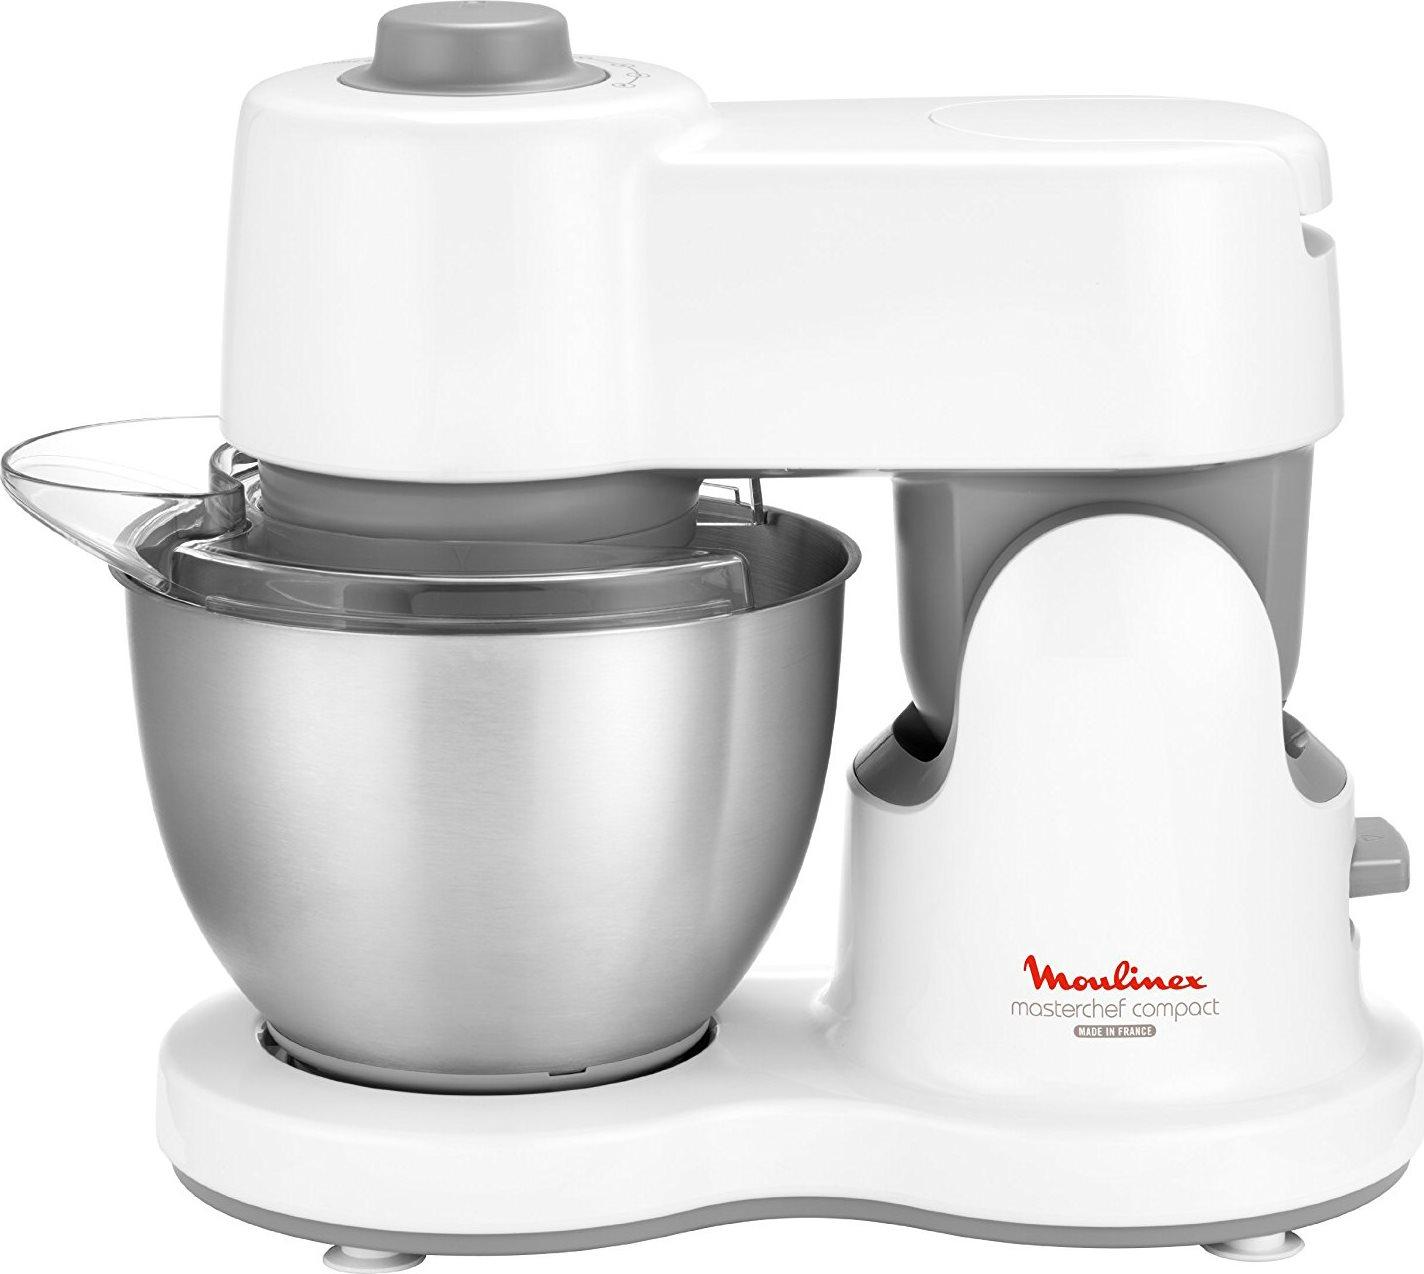 Moulinex robot da cucina capacit 3 5 litri potenza 700 - Robot da cucina masterchef ...